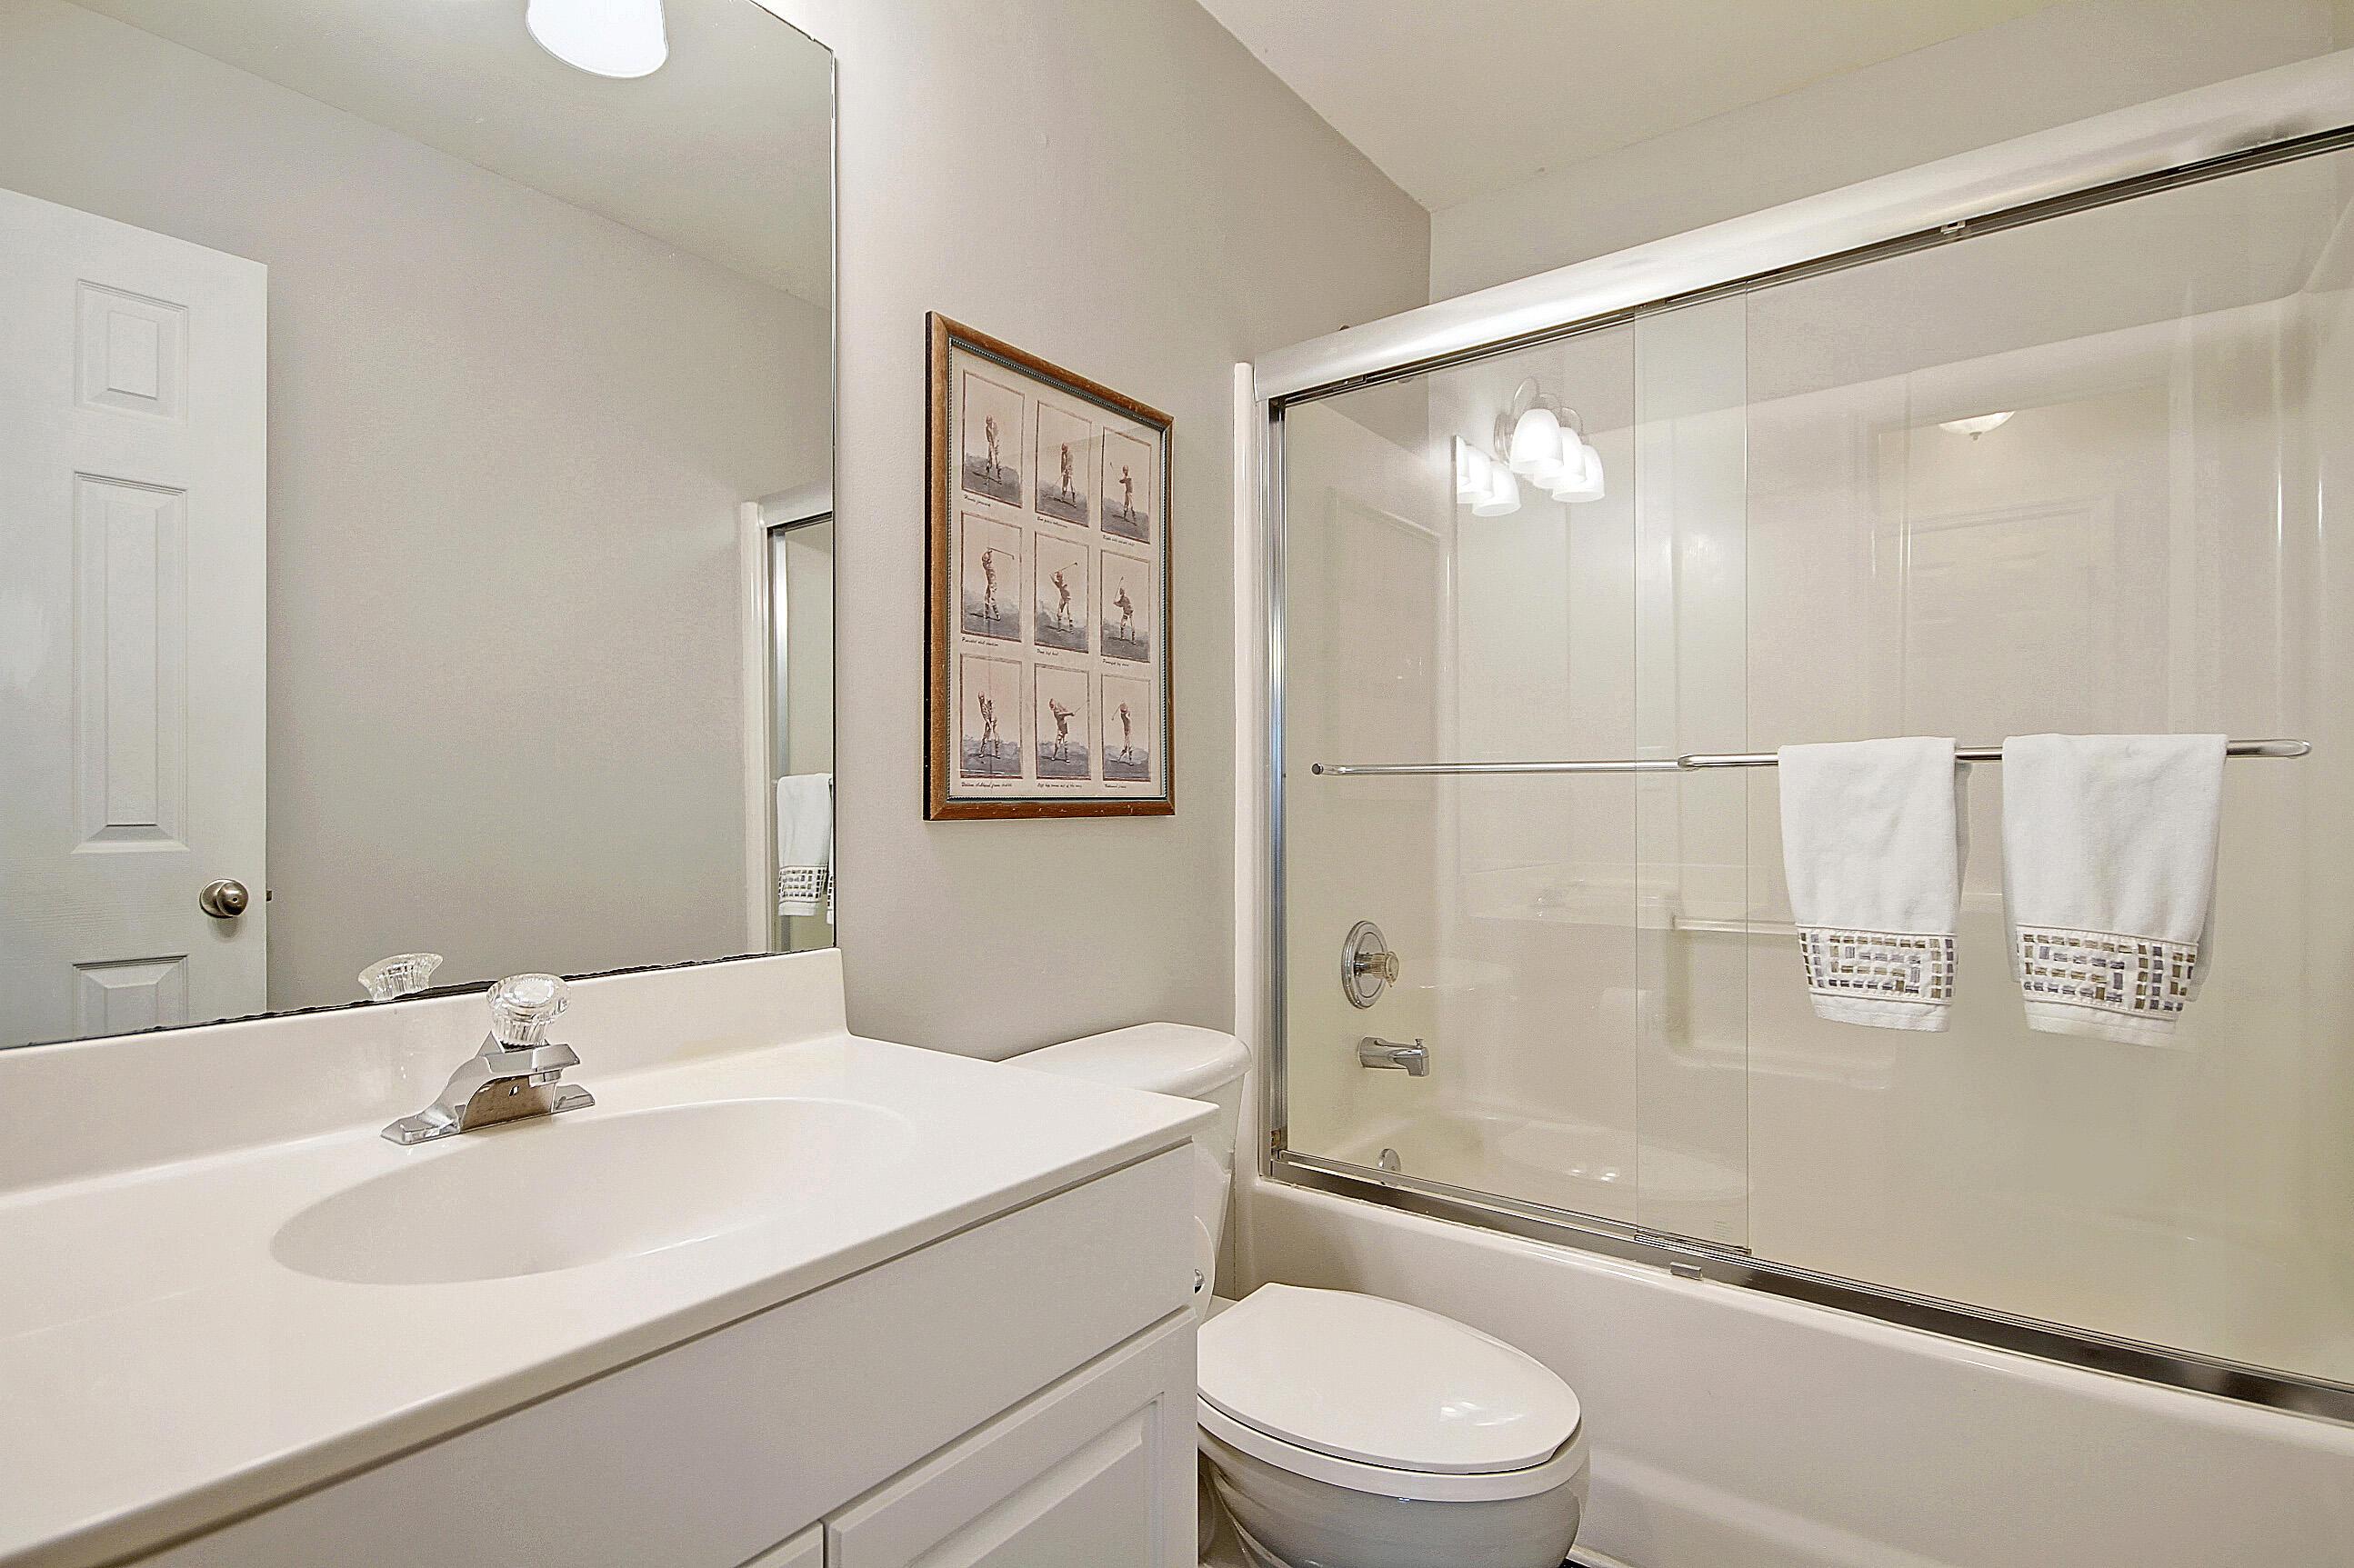 Park West Homes For Sale - 1460 Wellesley, Mount Pleasant, SC - 22